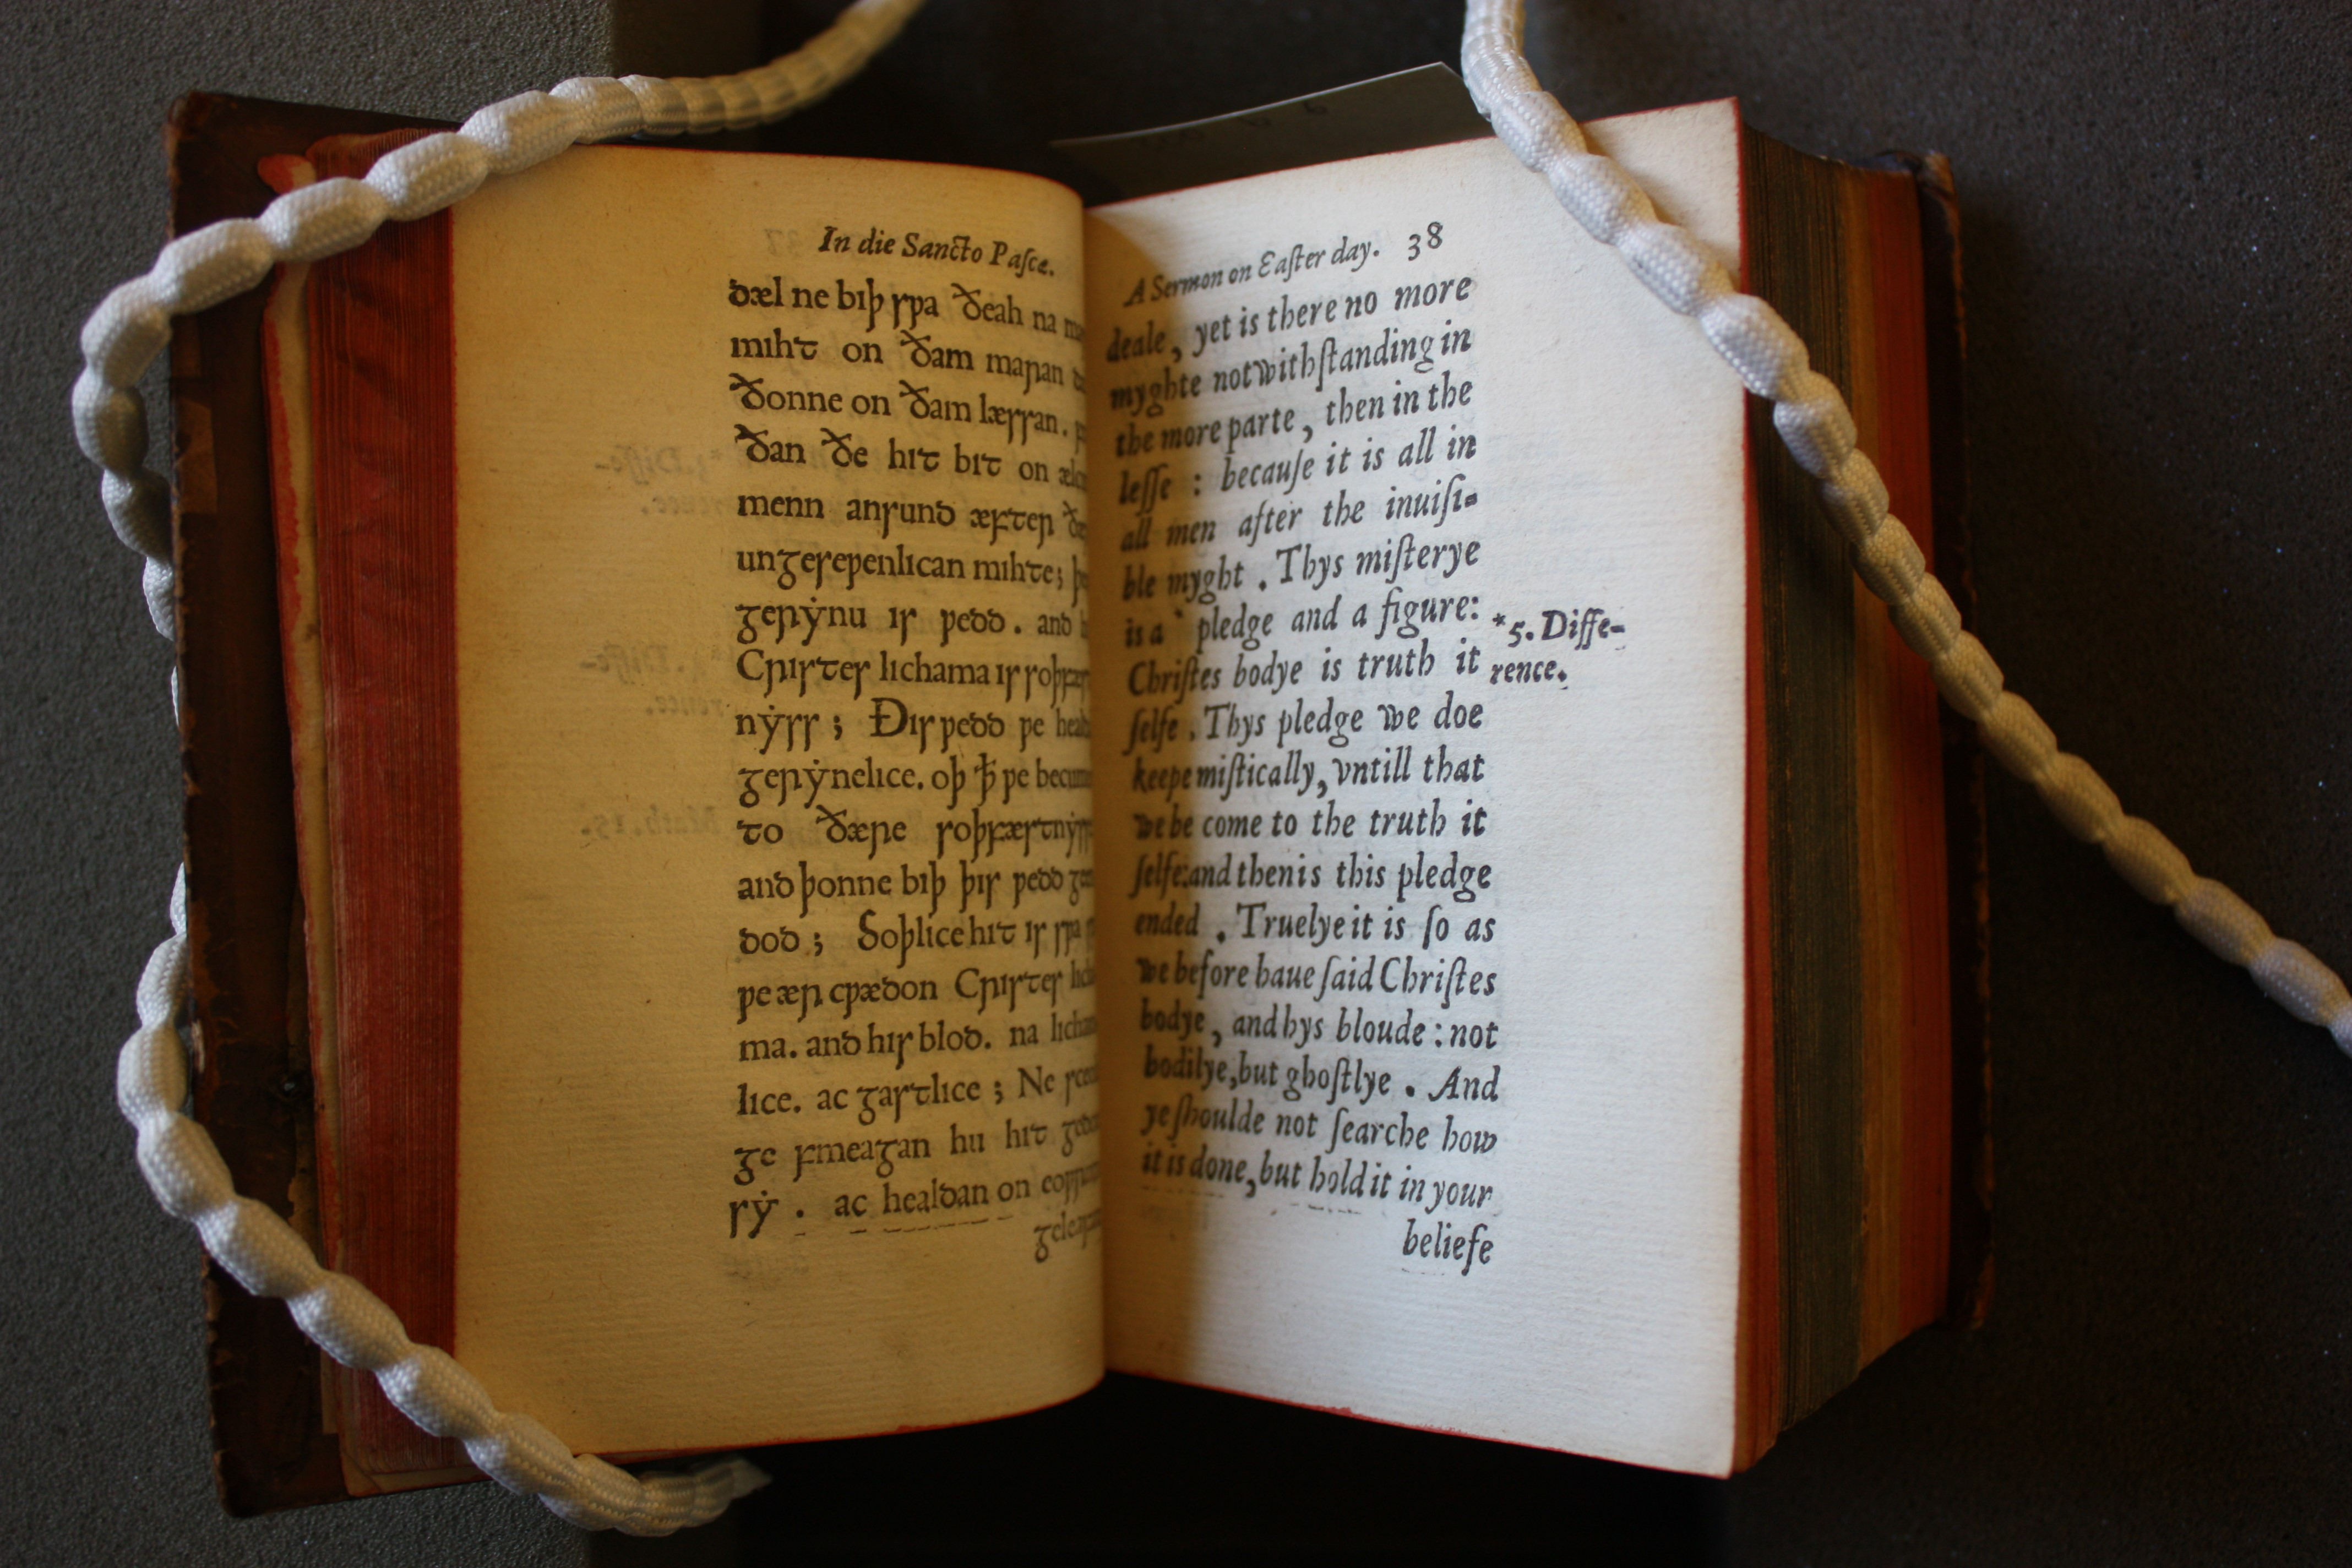 Reformation_300 b 6(1)_01_Testimonie of Antiquity